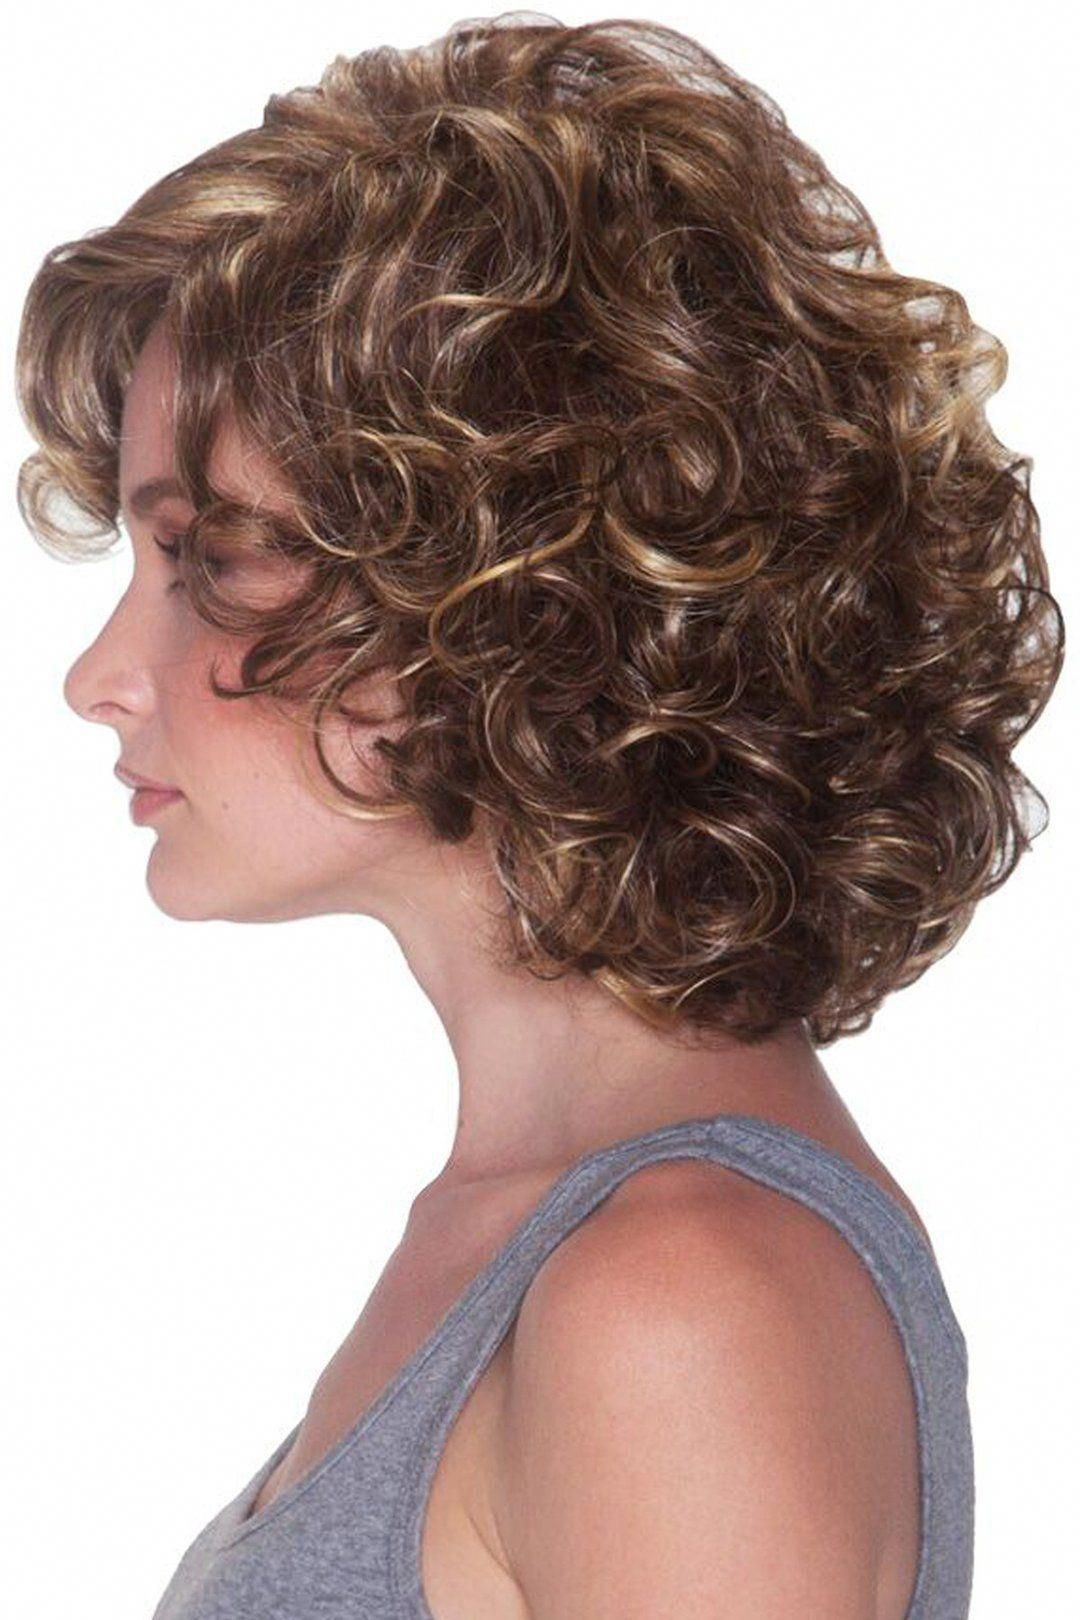 Belle tress wigs malibu 6031 curly hair styles